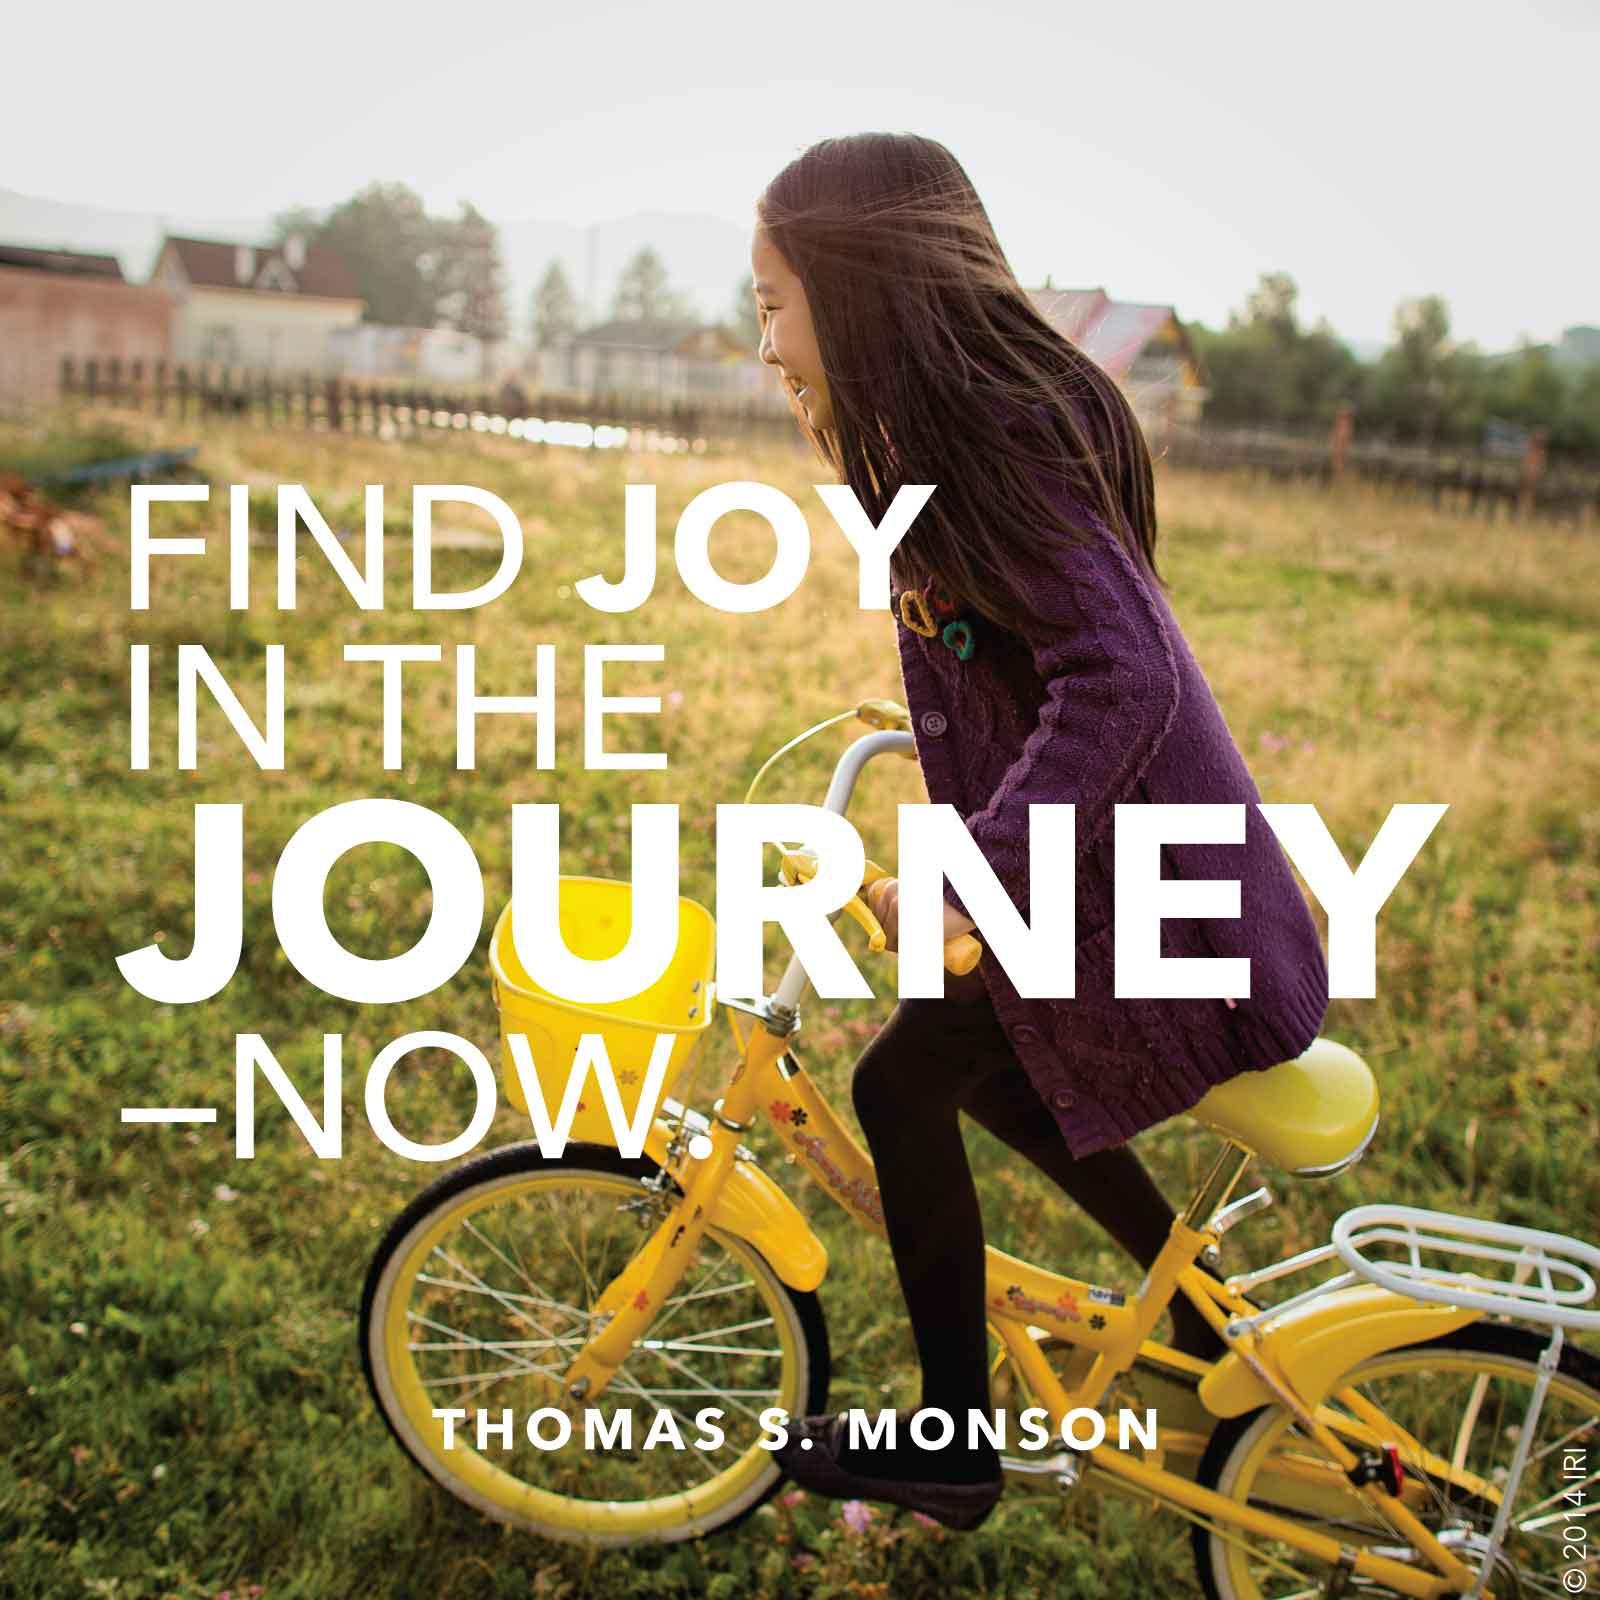 meme-monson-joy-journey